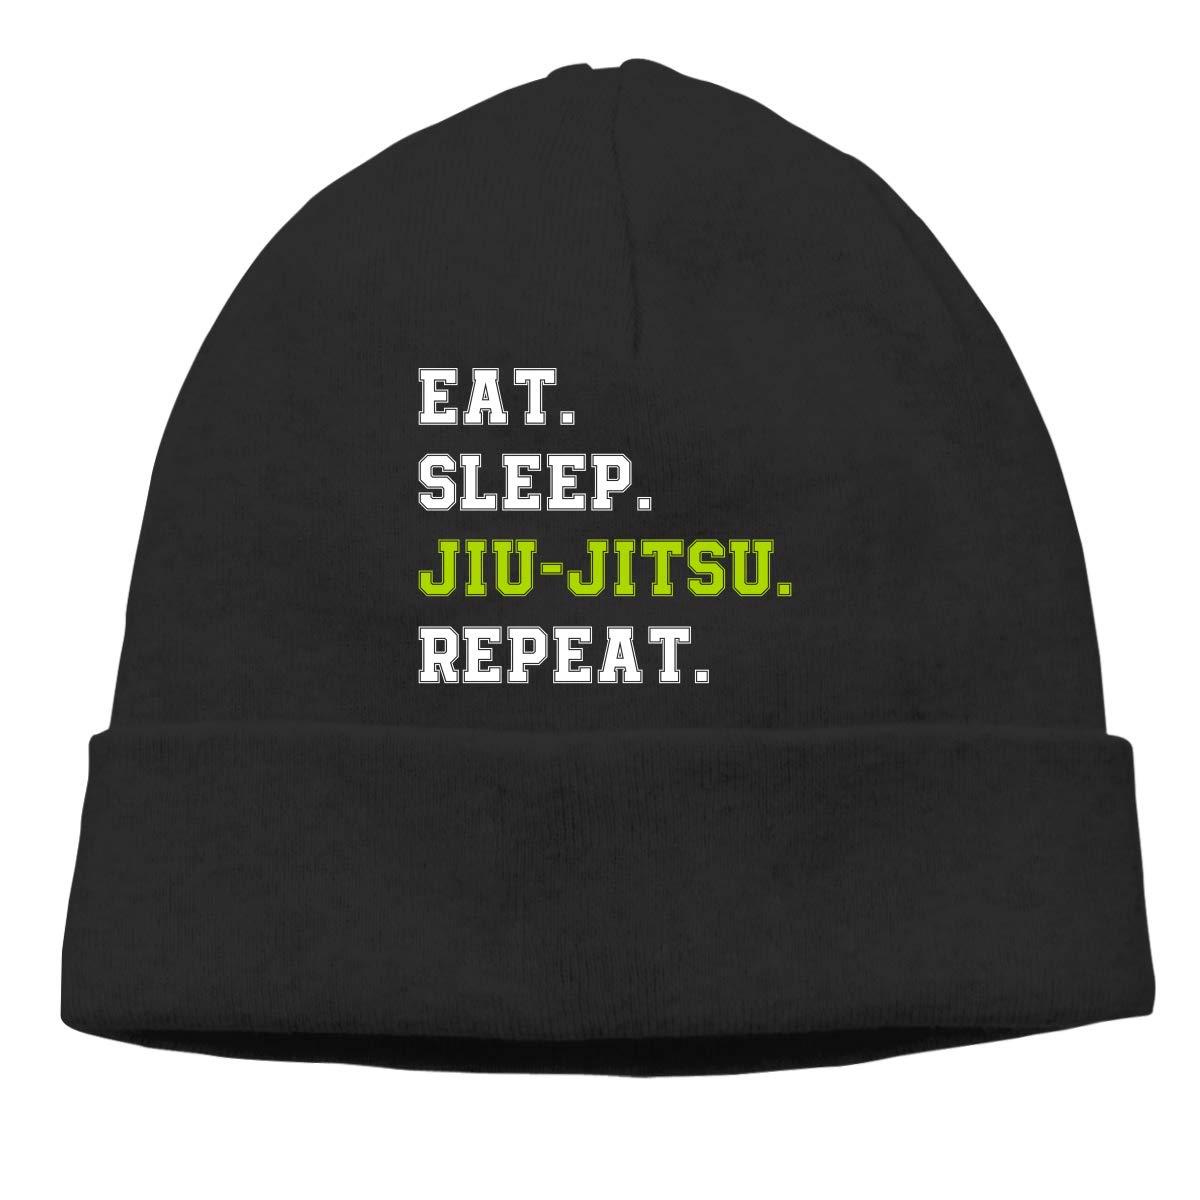 Beanie Hat Eat Sleep Jiu-Jitsu Repeat Warm Skull Caps for Men and Women